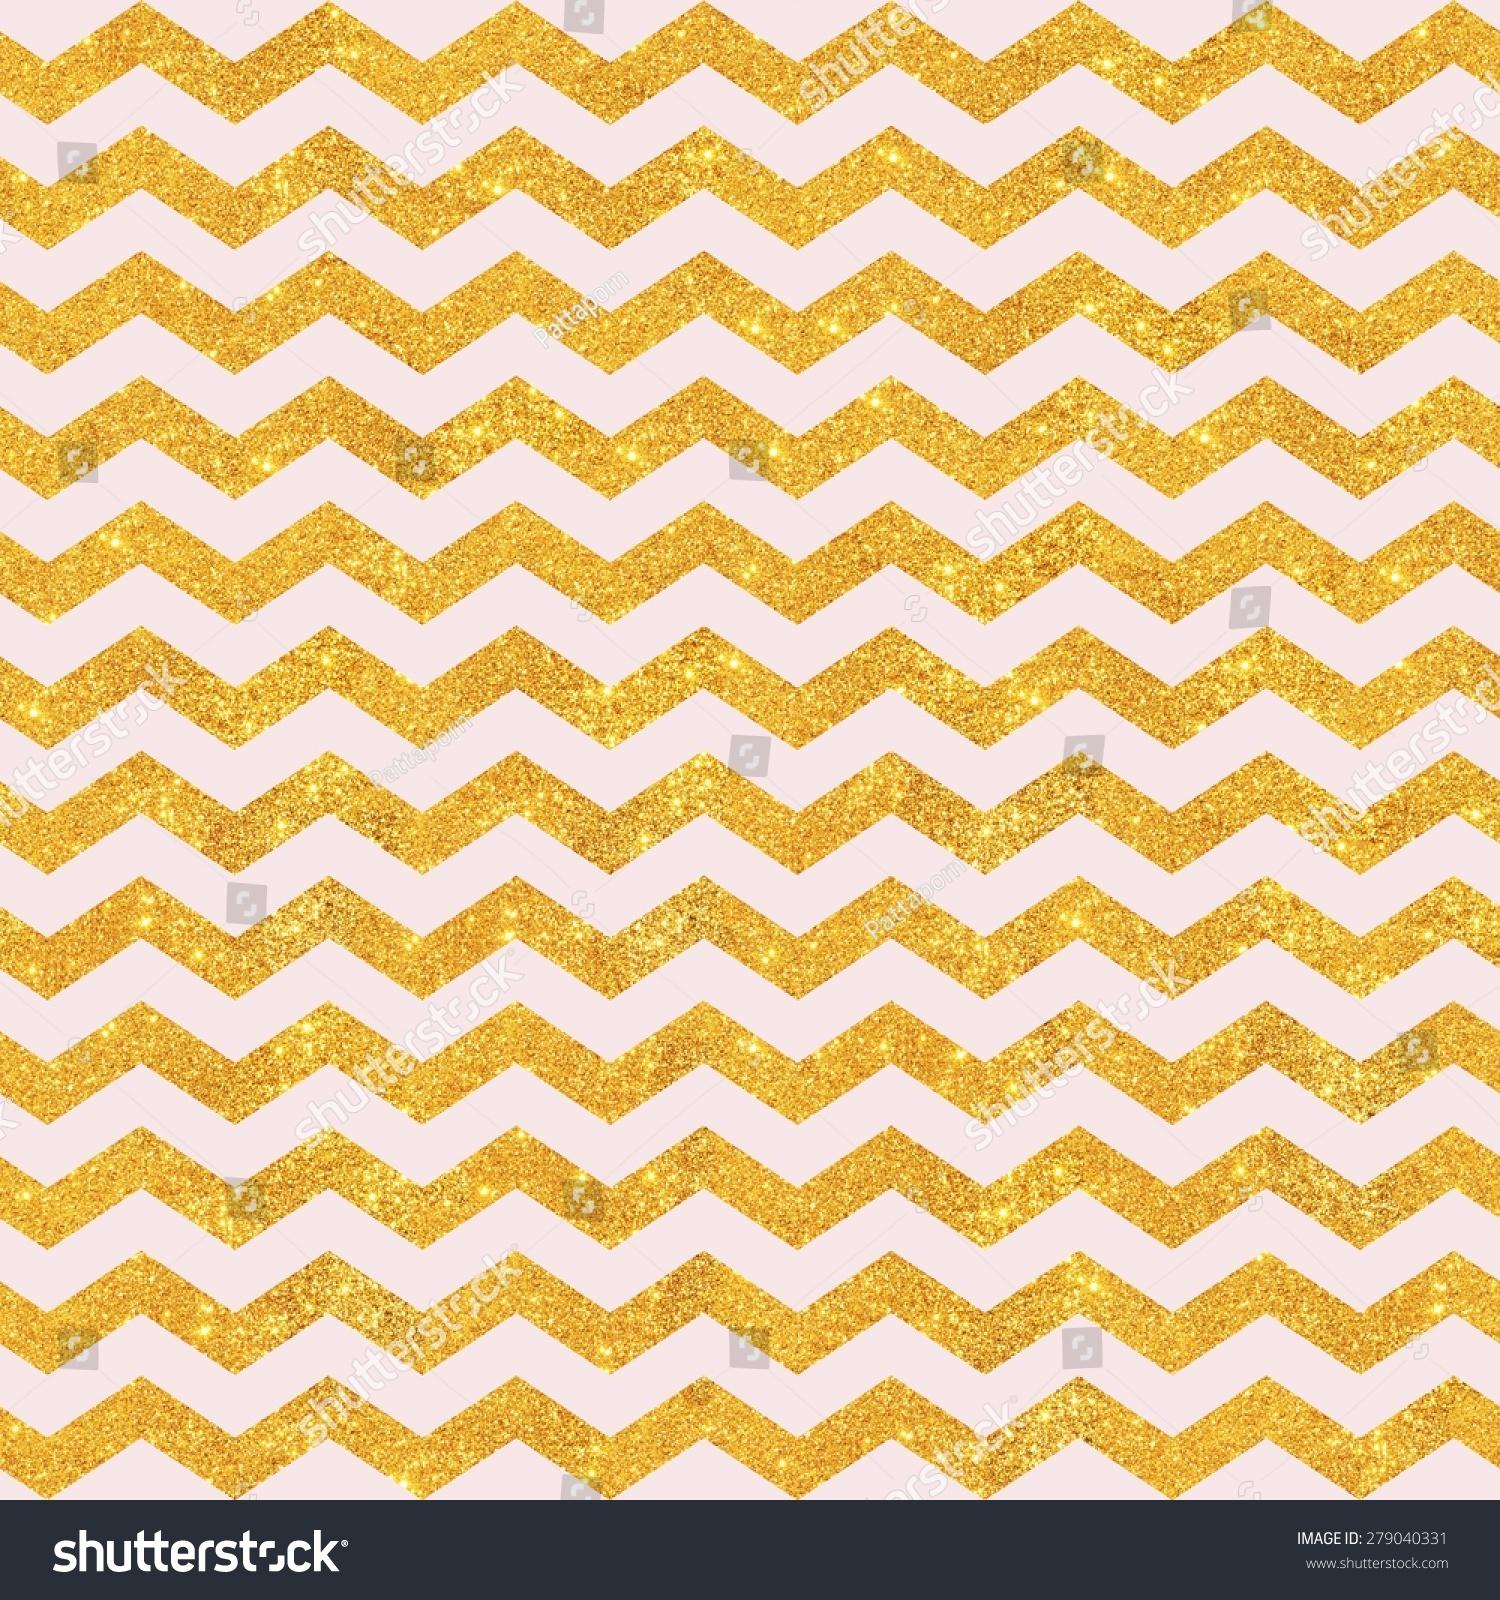 Pink Gold Glitter Large Chevron Pattern Seamless Texture Background Digital Paper For Scrapbook